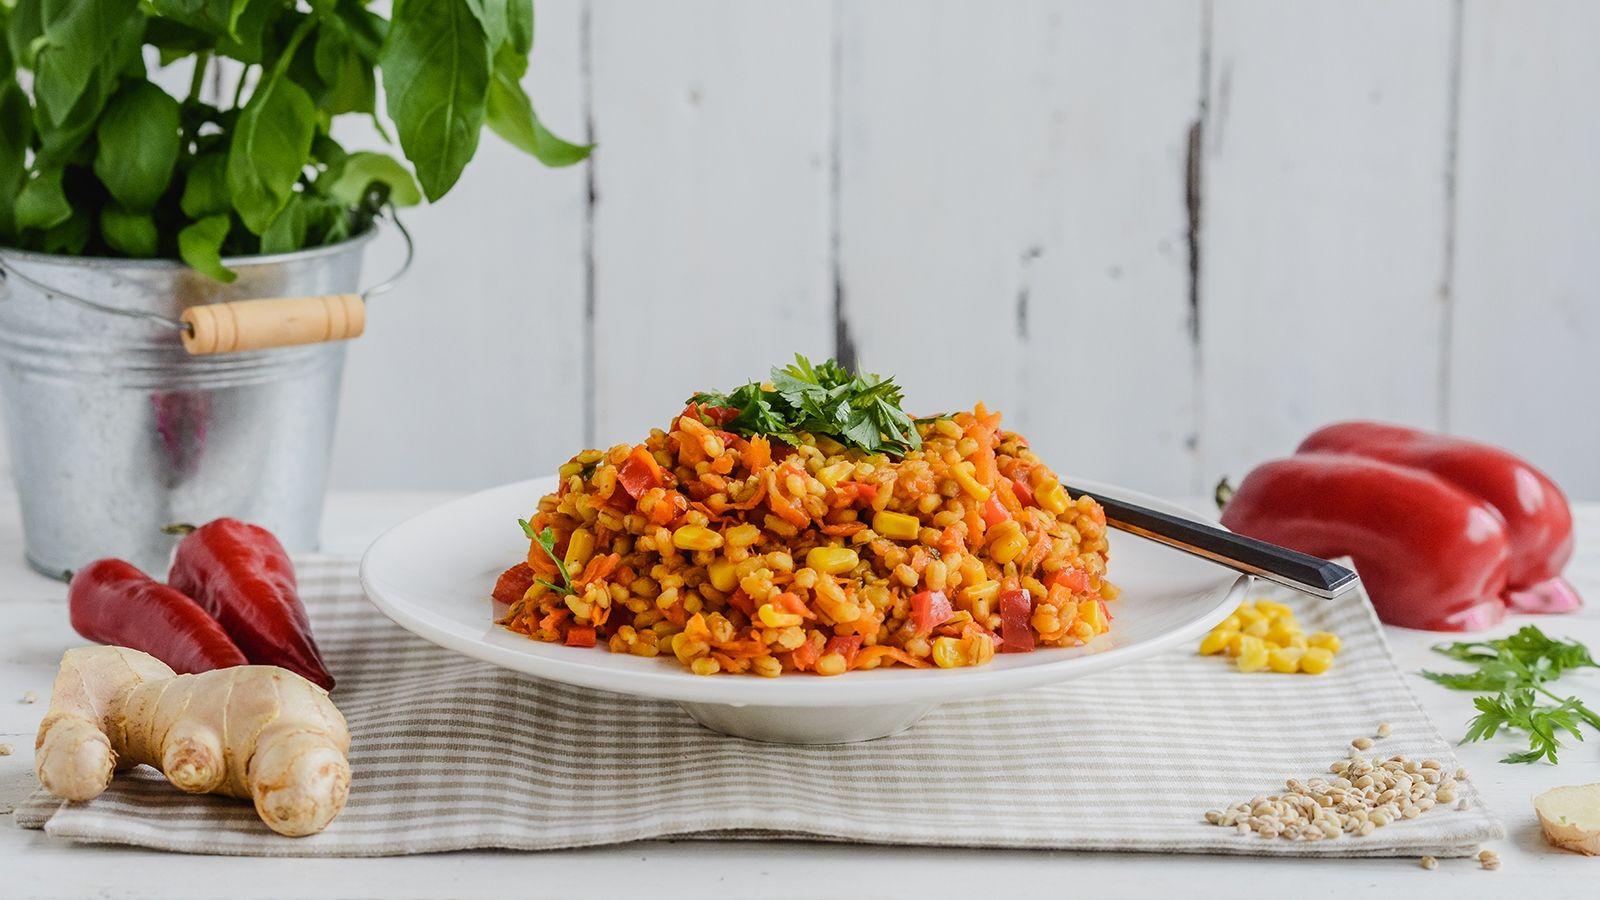 Kaszotto chakalaka z papryką, imbirem, kukurydzą i kolendrą